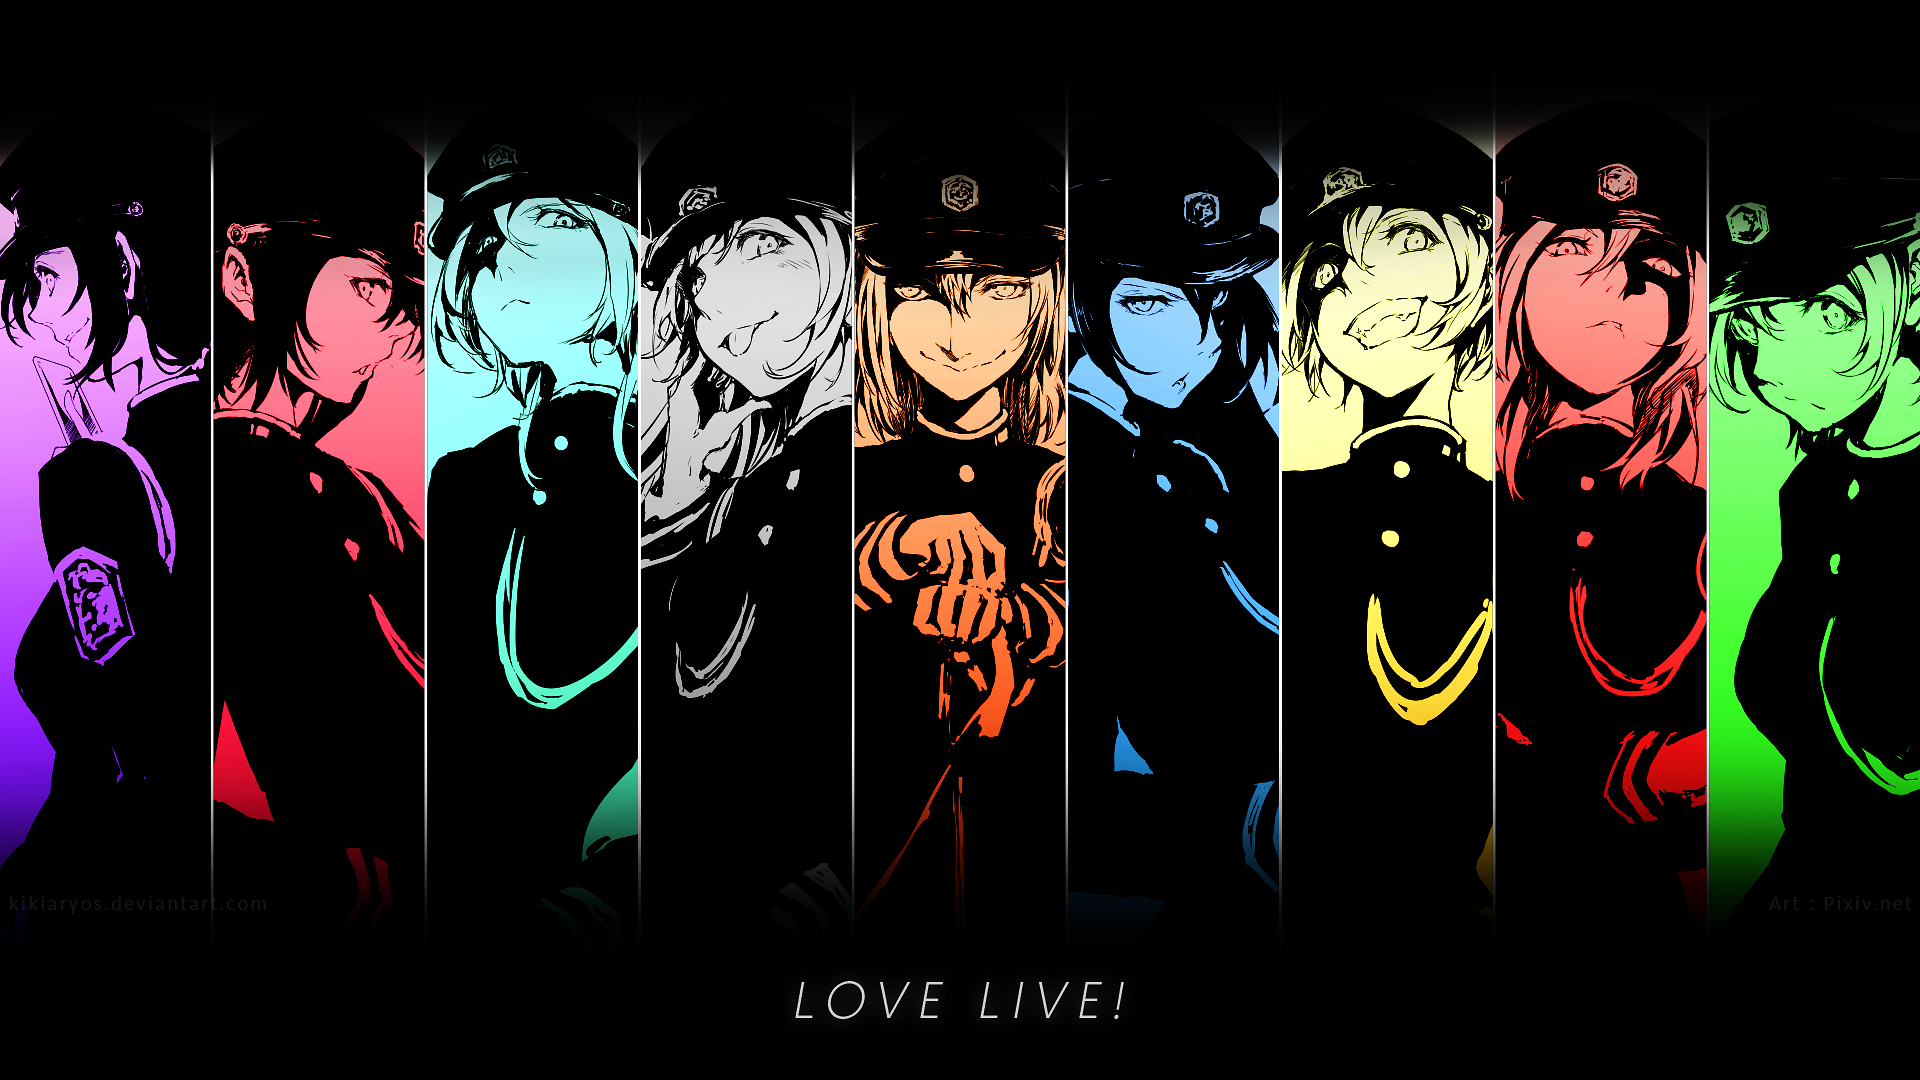 [96+] Love Live! Wallpapers on WallpaperSafari